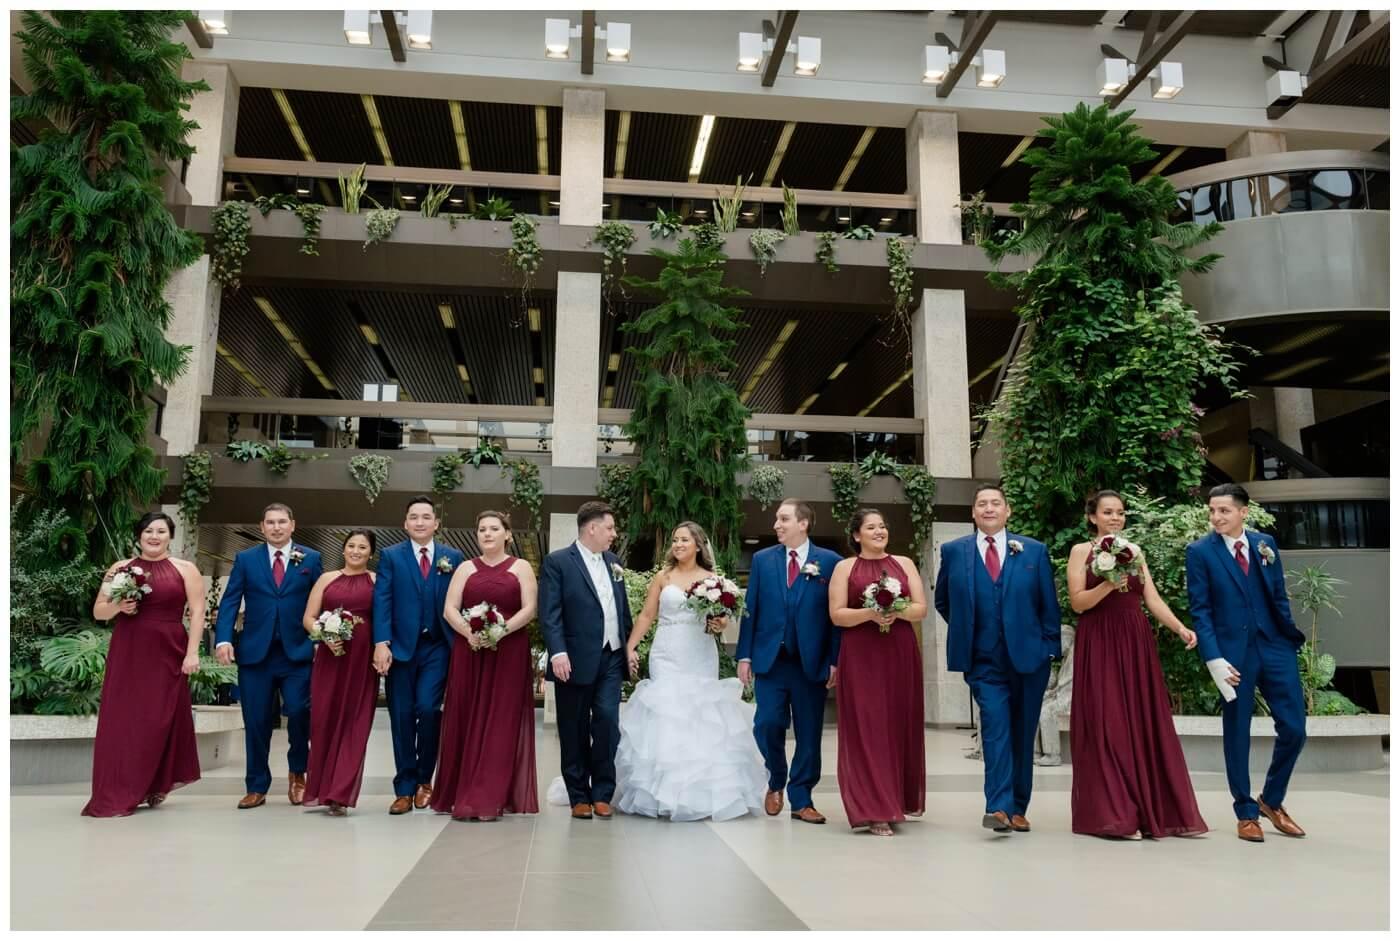 Regina Wedding Photography - Laurie - Destiny - Fall Wedding - TC Douglas Building - Bridal Party - Wine Dresses - Blue Suits & Red Tie